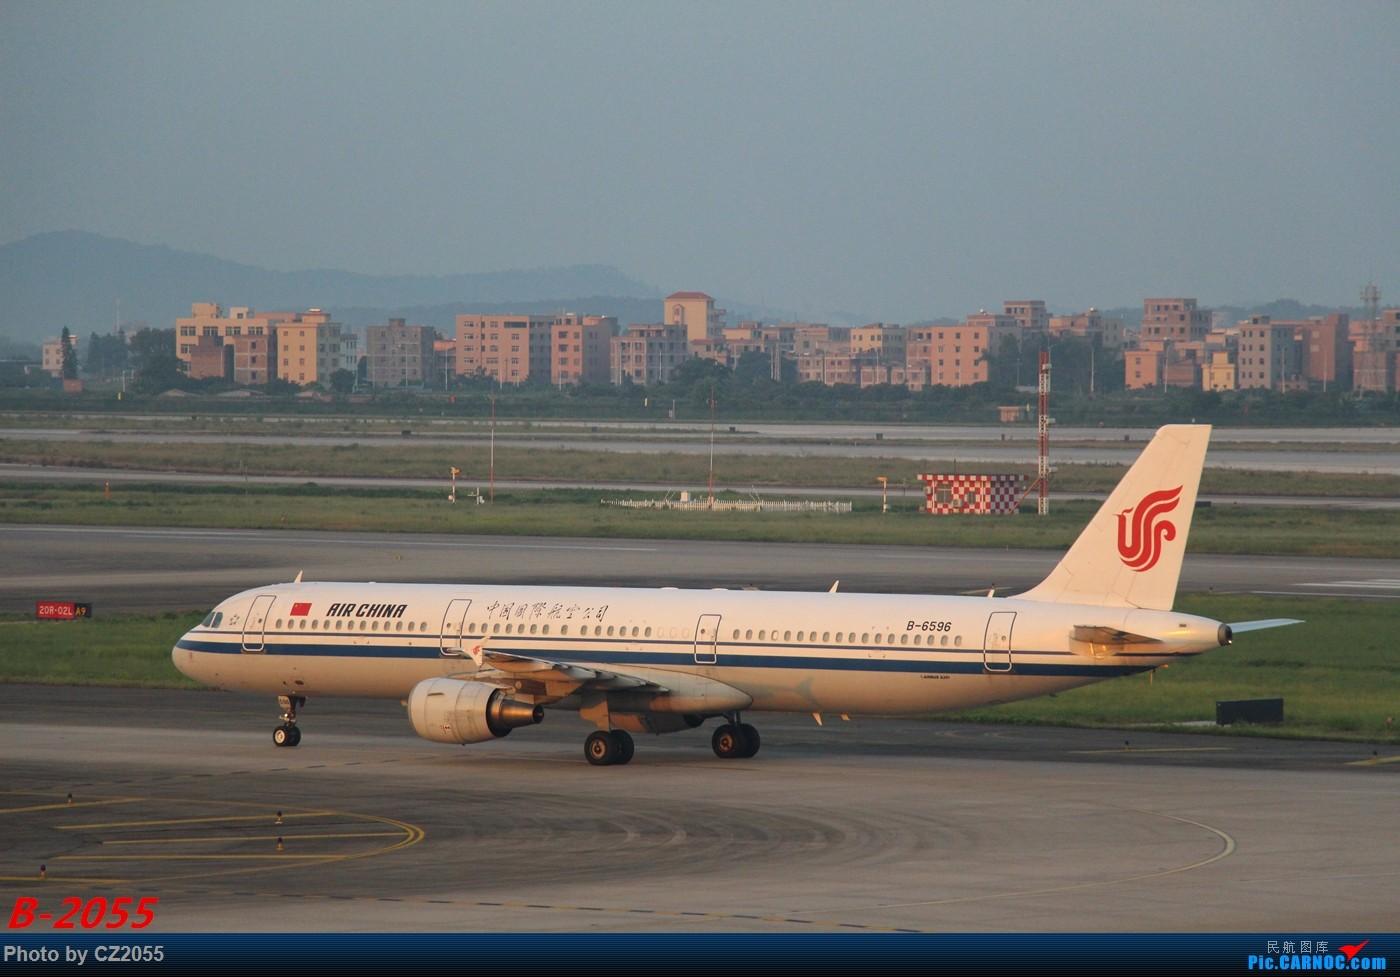 Re:[原创]Re:[原创]【广东青少年拍机小队】【C-Z-2055】发完737和宽体就升级320,那就再发一组320系列。 AIRBUS A321-200 B-6596 中国广州白云国际机场